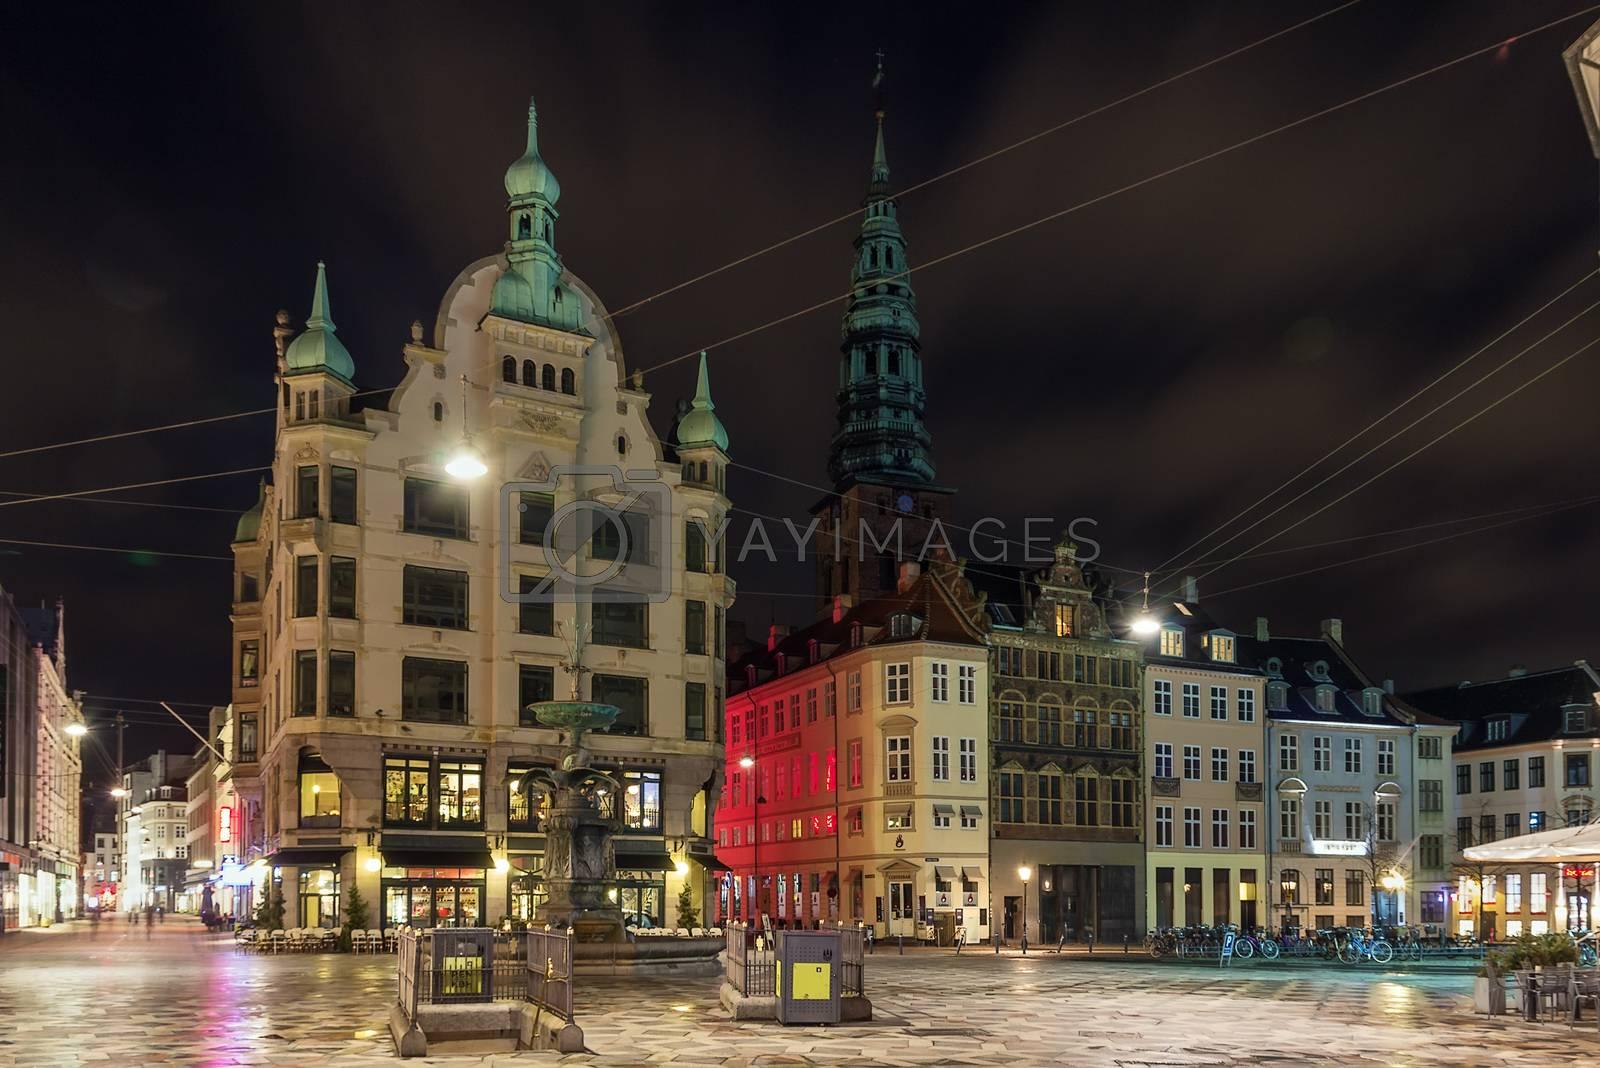 Hojbro Square in evening, Copenhagen by borisb17